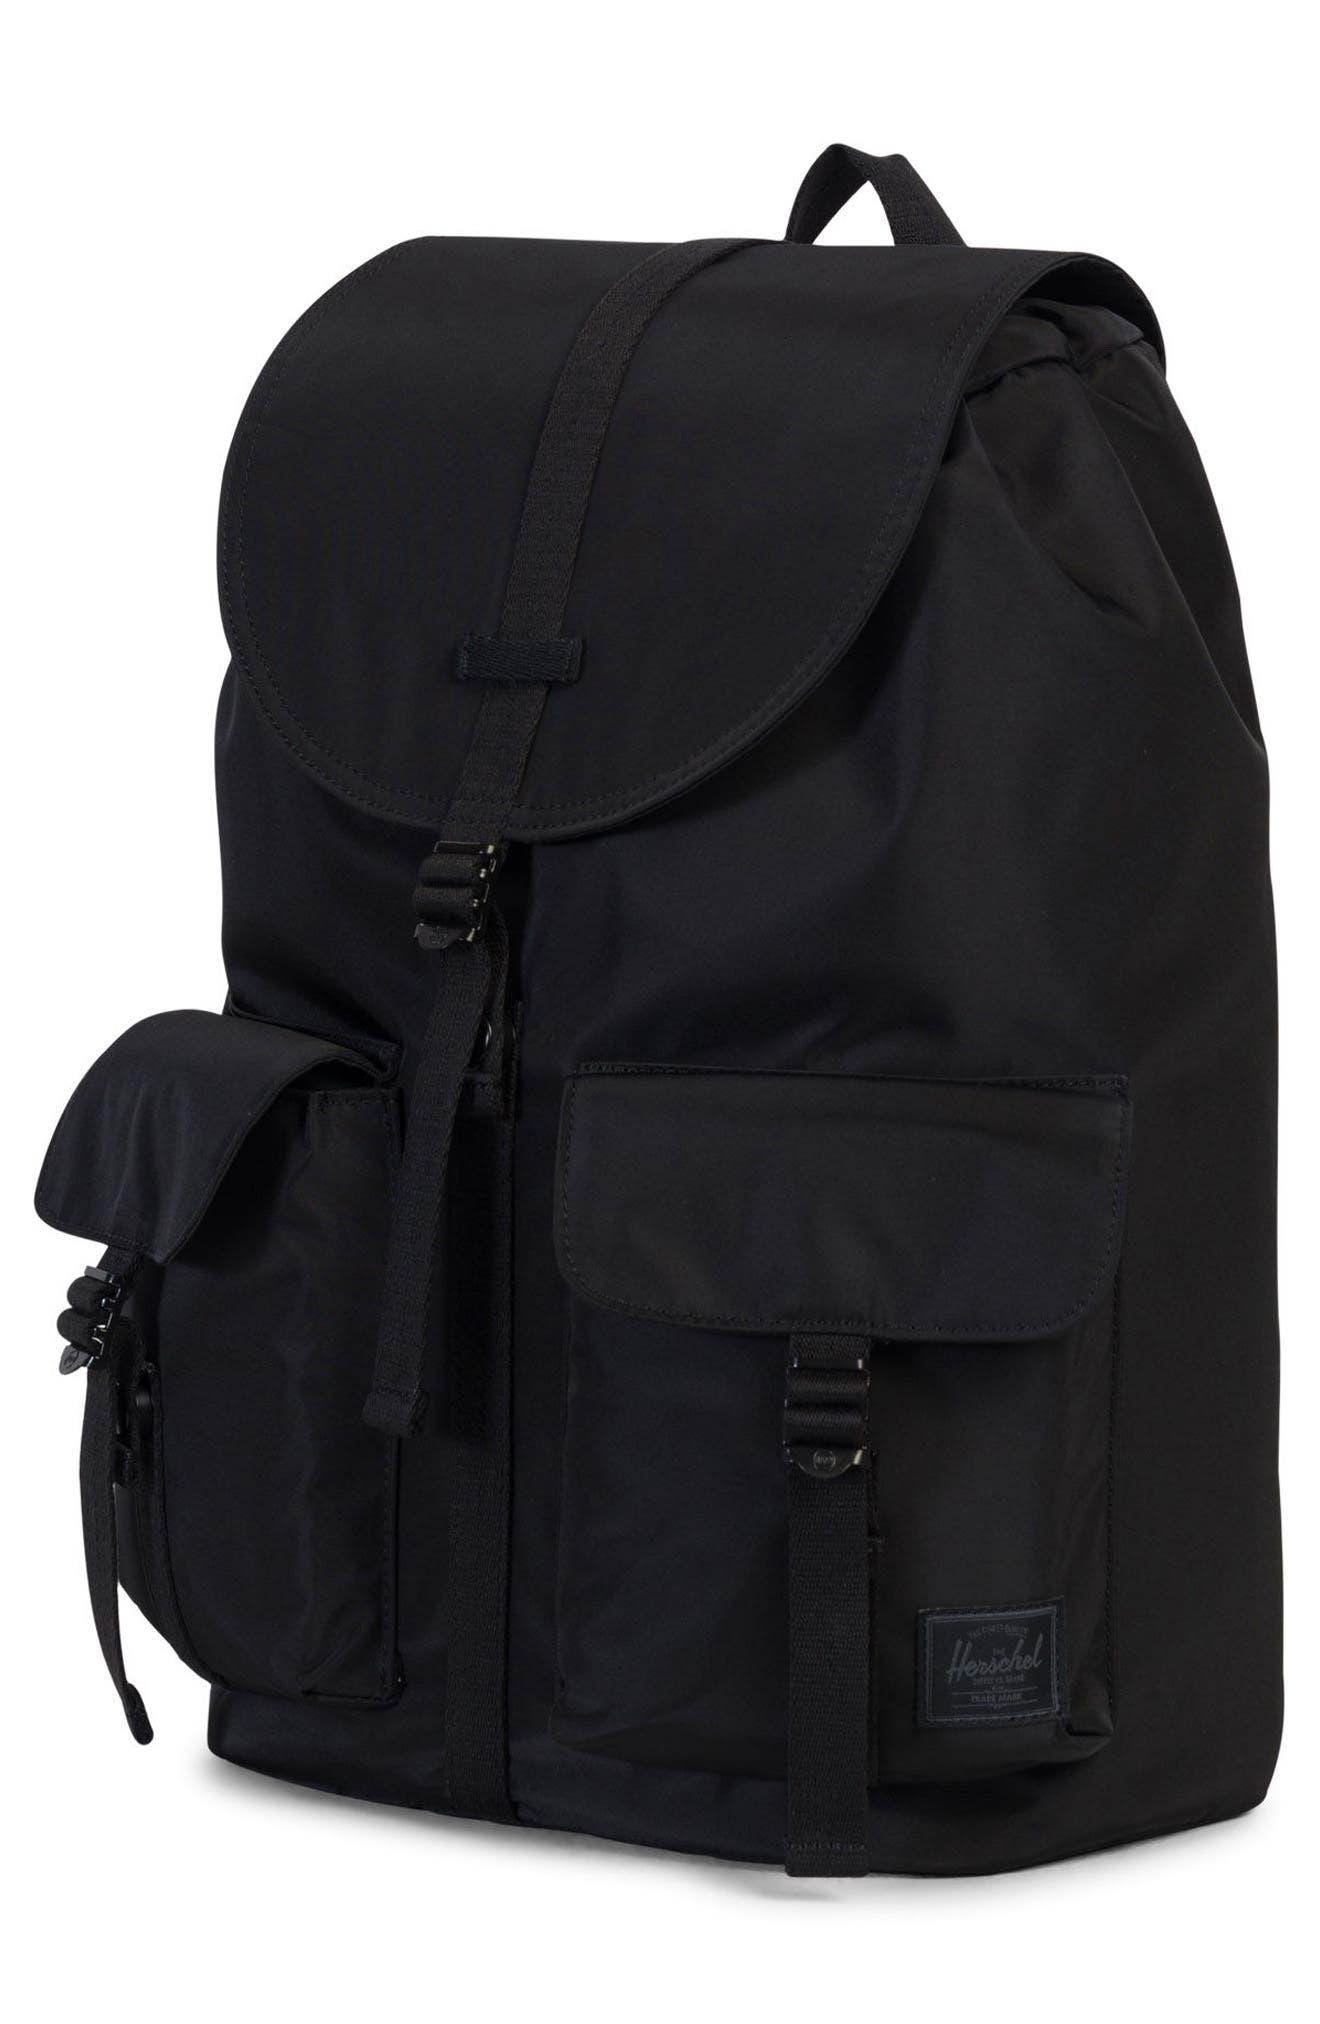 Dawson Surplus Collection Backpack,                             Alternate thumbnail 4, color,                             Black